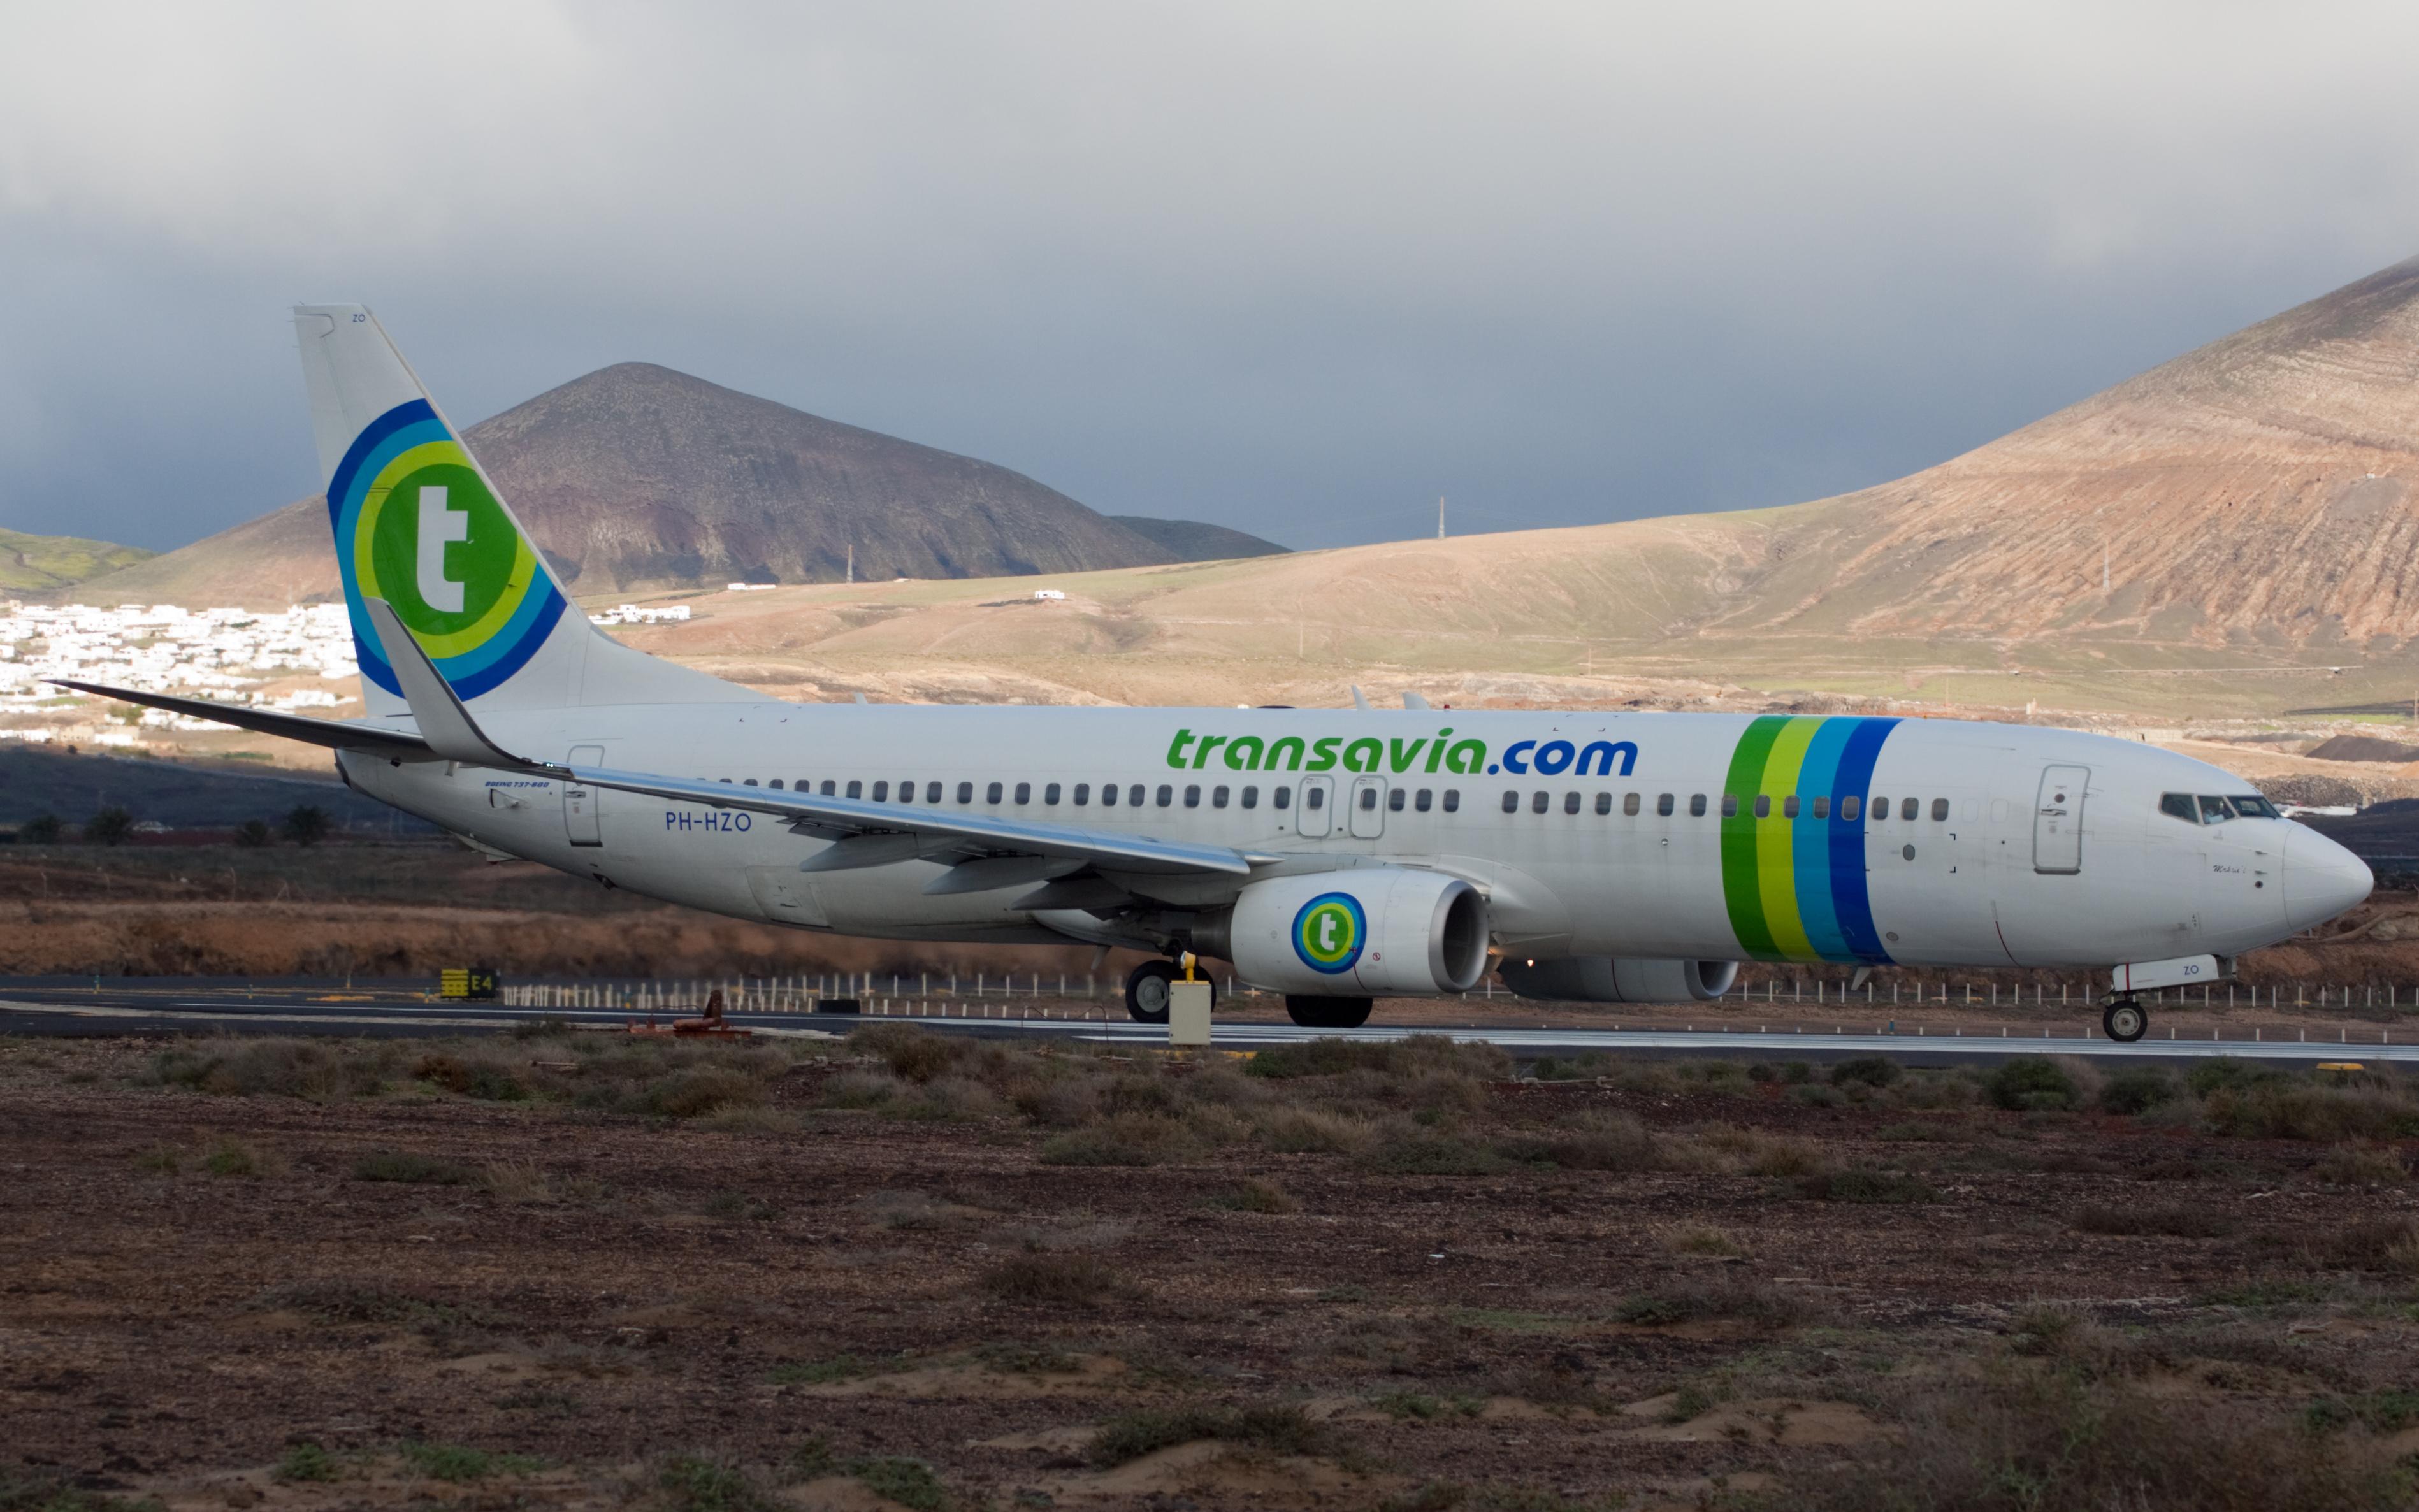 Transavia_Airlines_B737-800_PH-HZO_(3232891774)